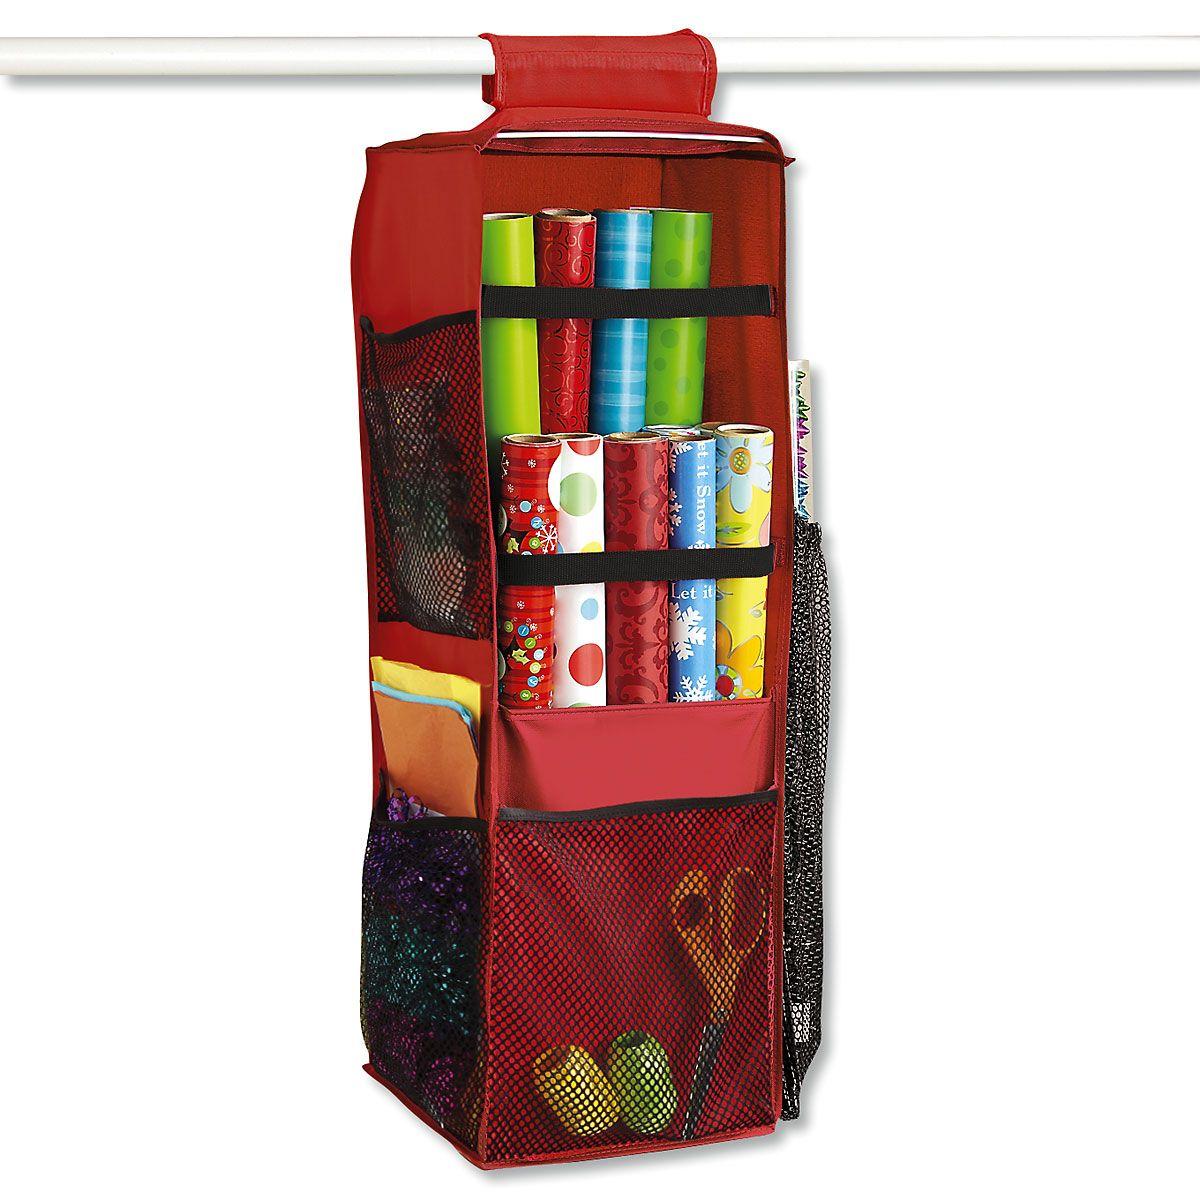 Closet Rod Gift-Wrap Organizer